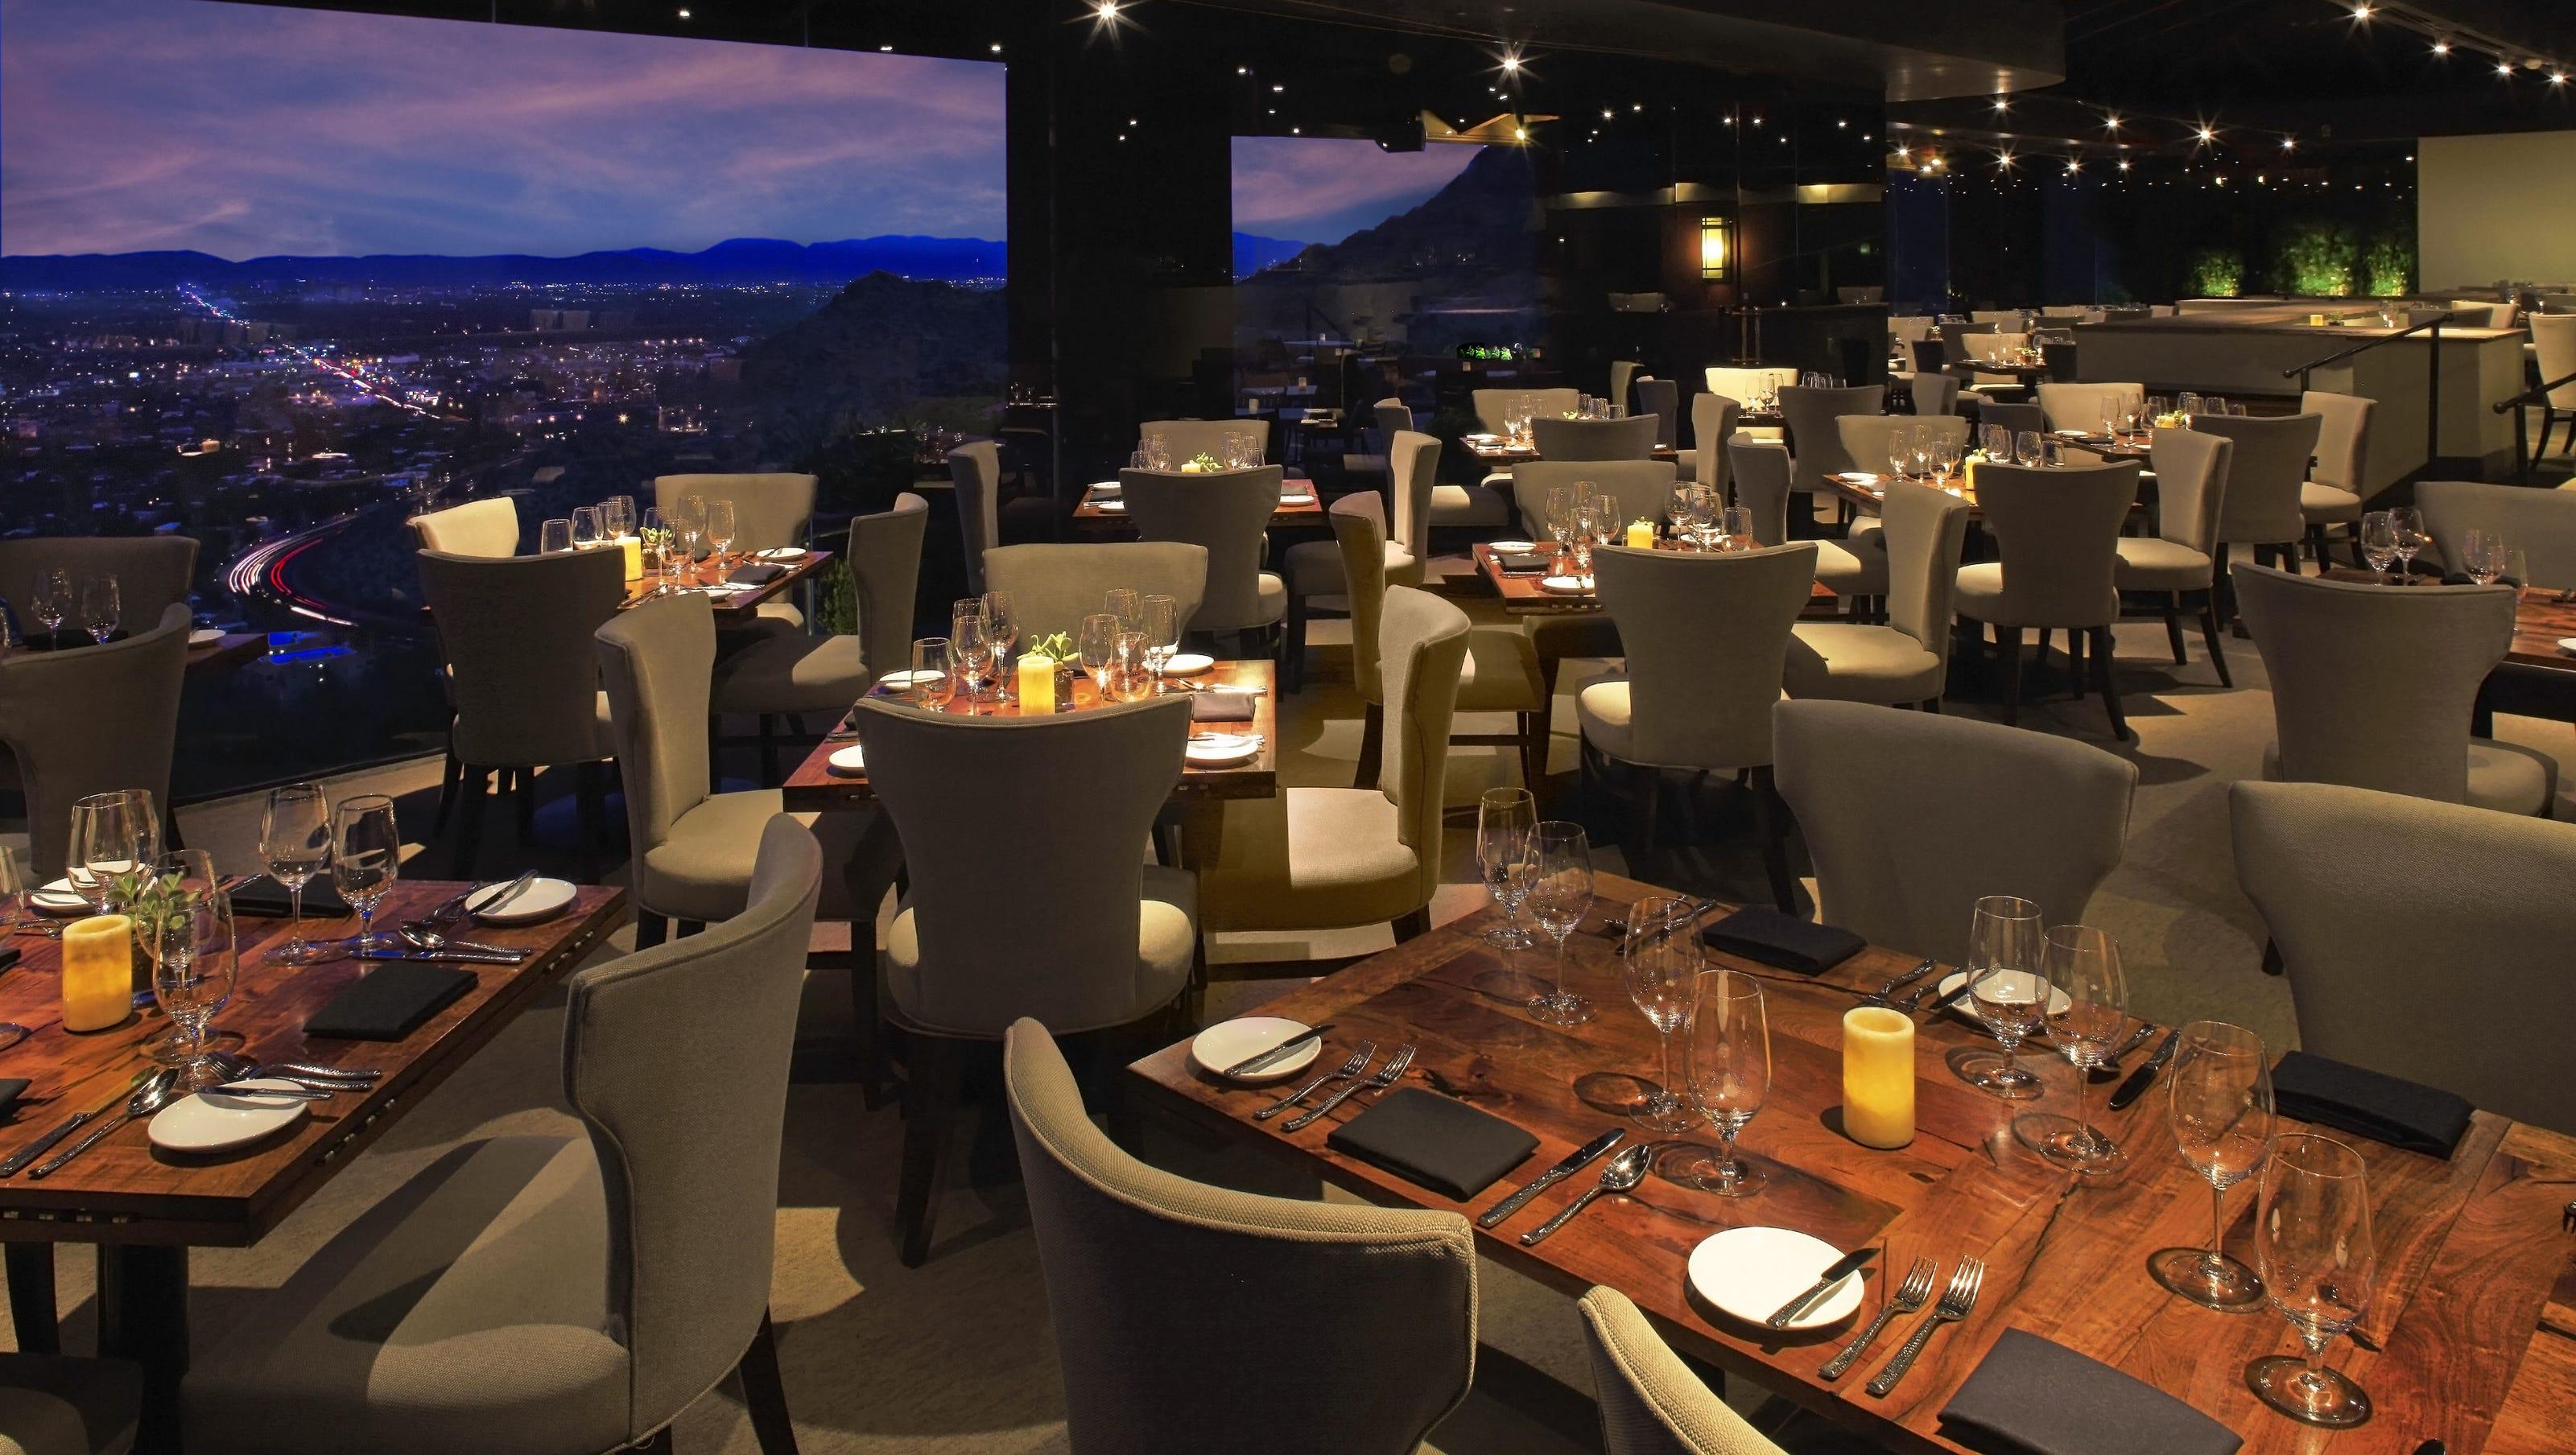 Restaurants Open On Christmas Eve 2020 Teharu 32 Phoenix restaurants open on Christmas Day 2018